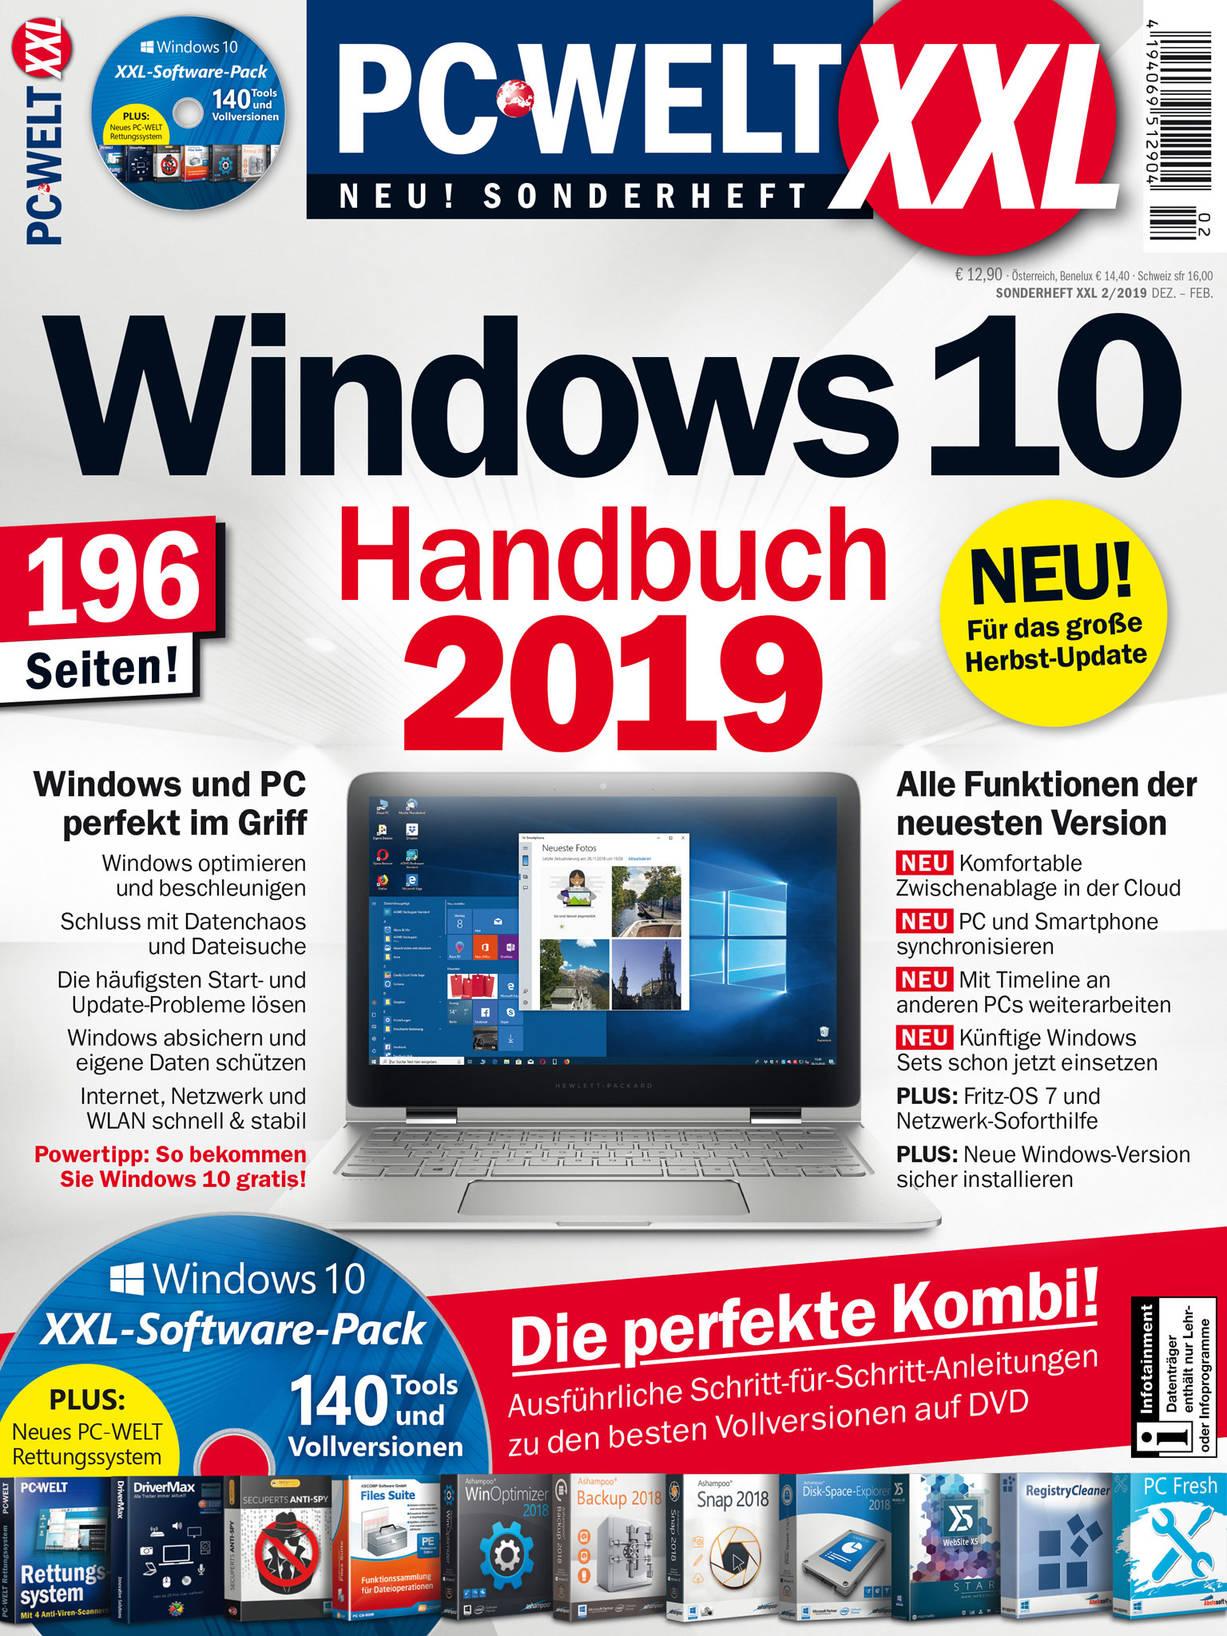 pc welt xxl windows 10 02 2019